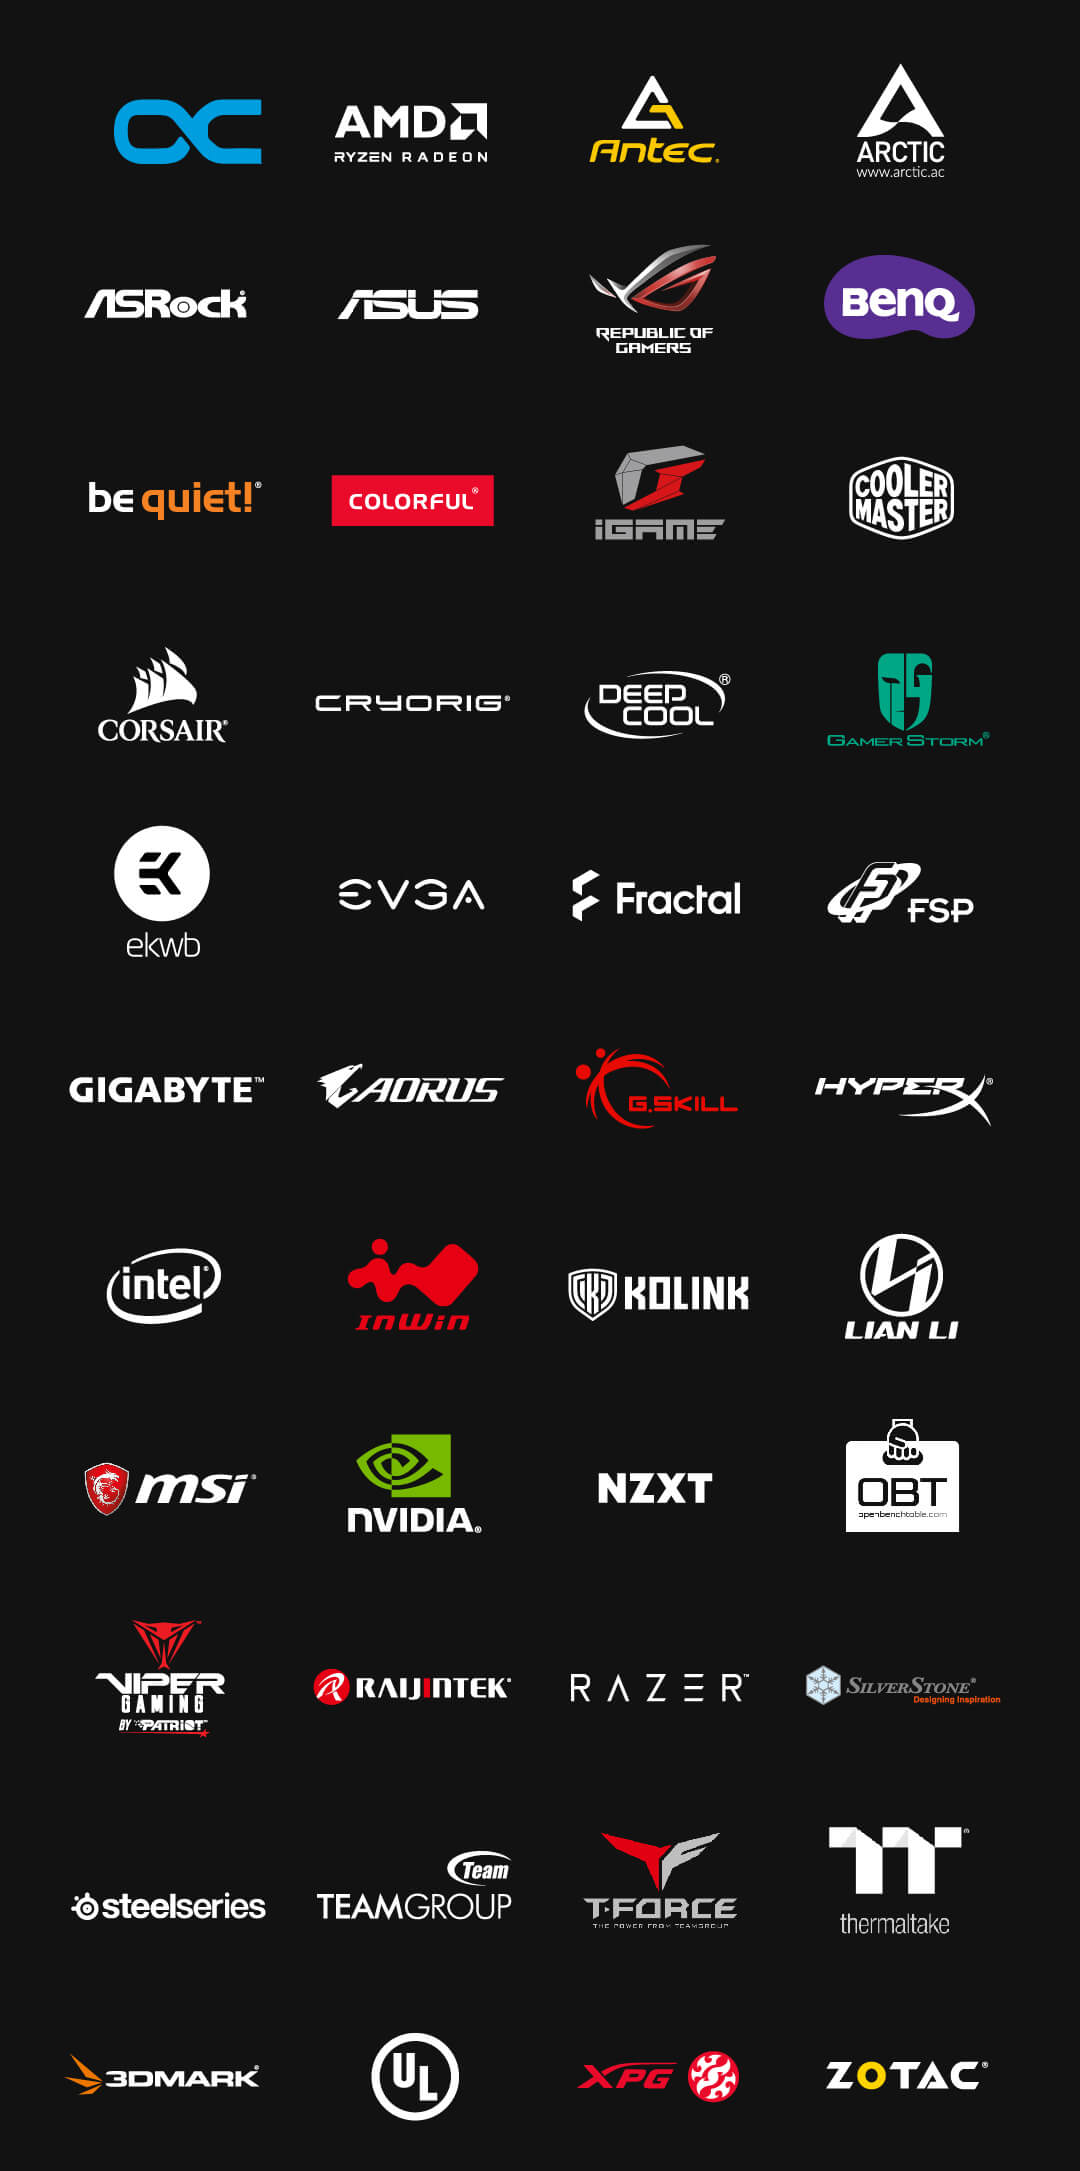 partners-grid-1080-1080x2171-f1dbcdf5b3a